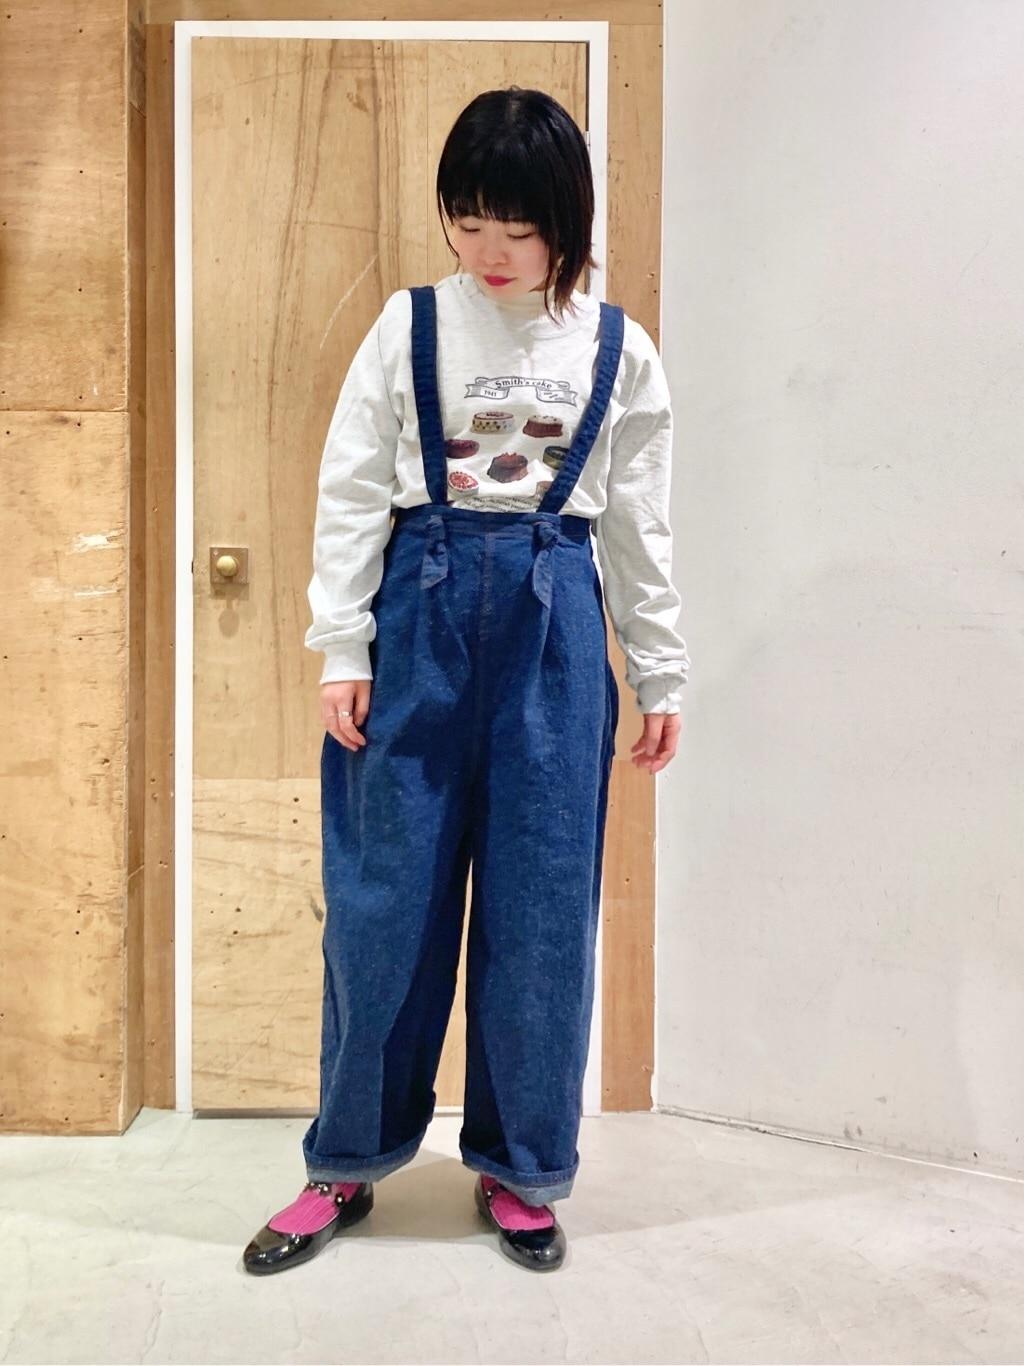 Malle chambre de charme 調布パルコ 身長:153cm 2021.03.02